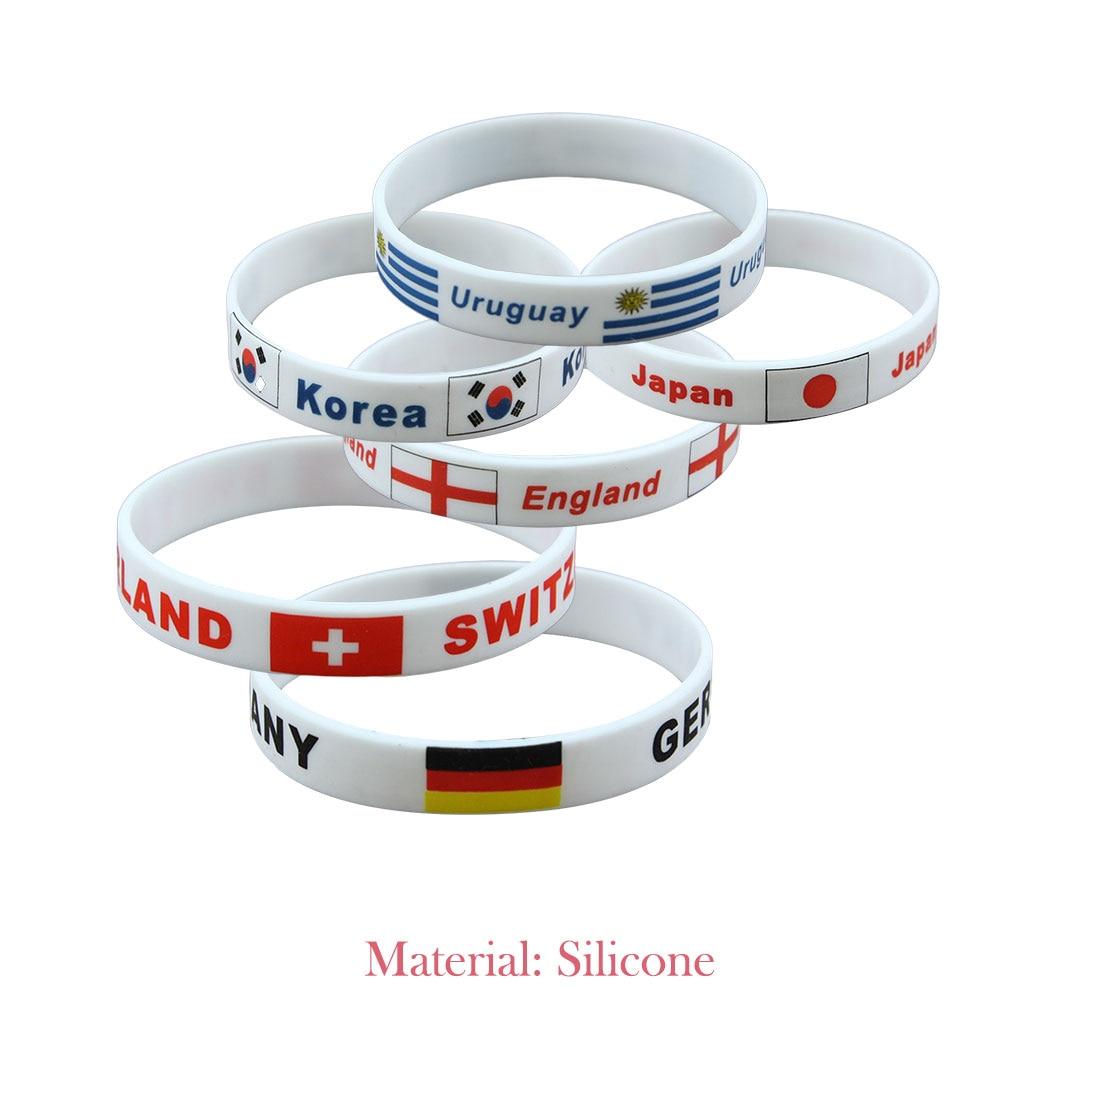 Brand New 1pcs Football Fans Bracelet Soccer fan Accessories Football Silicone Bracelet Cheerleading